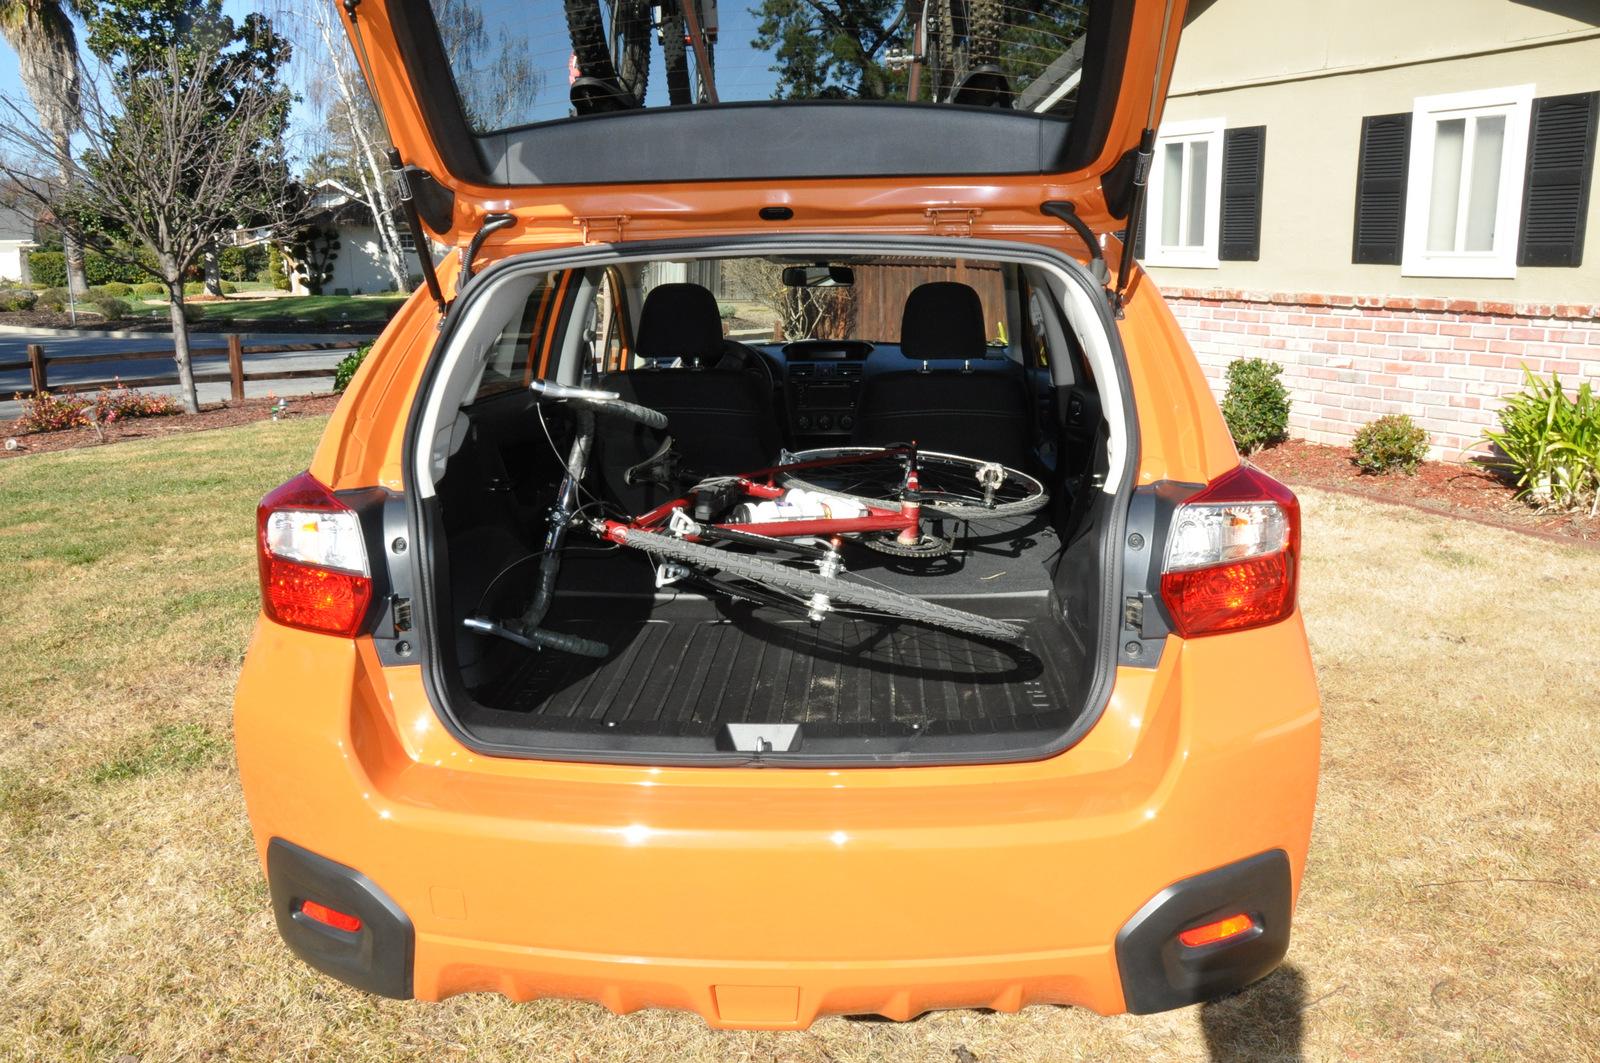 Subaru Crosstrek Bike Rack >> Review: Subaru XV Crosstrek – A good car for cyclists? | Road Bike News, Reviews, and Photos ...